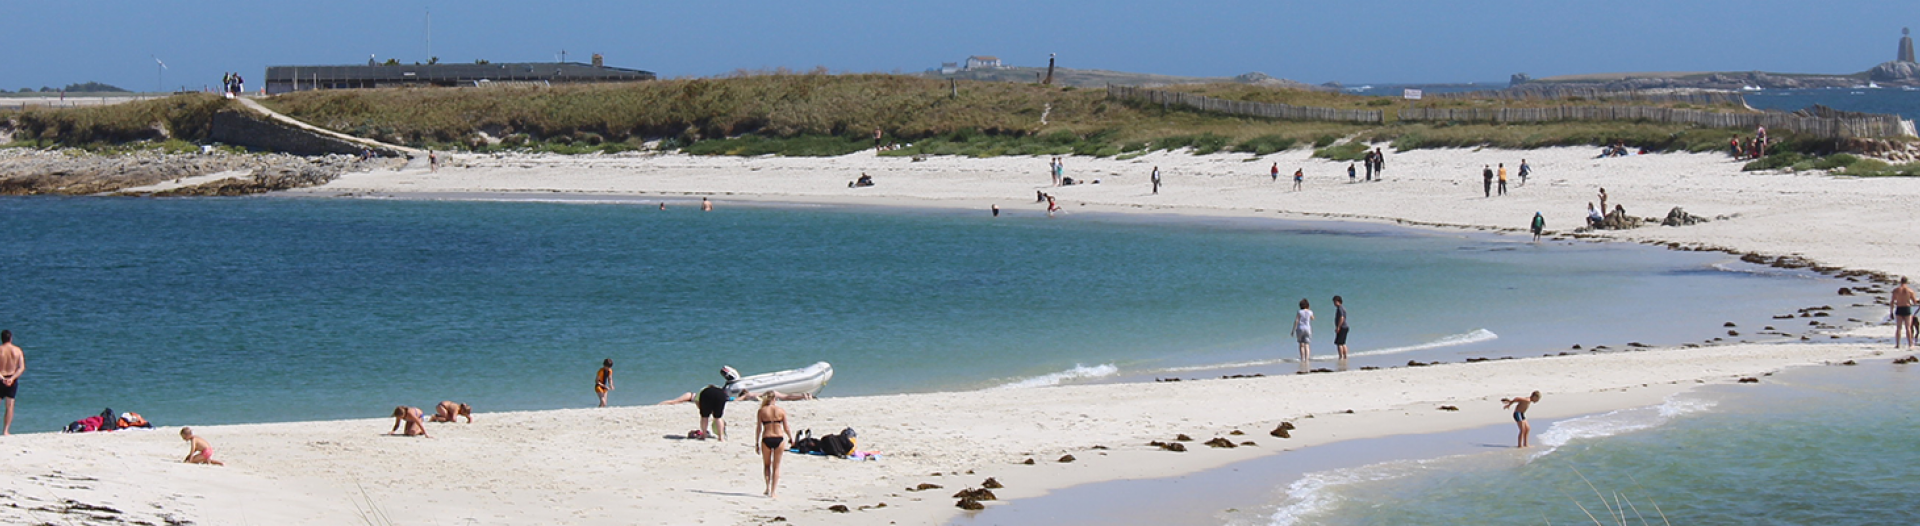 plage des iles glenan